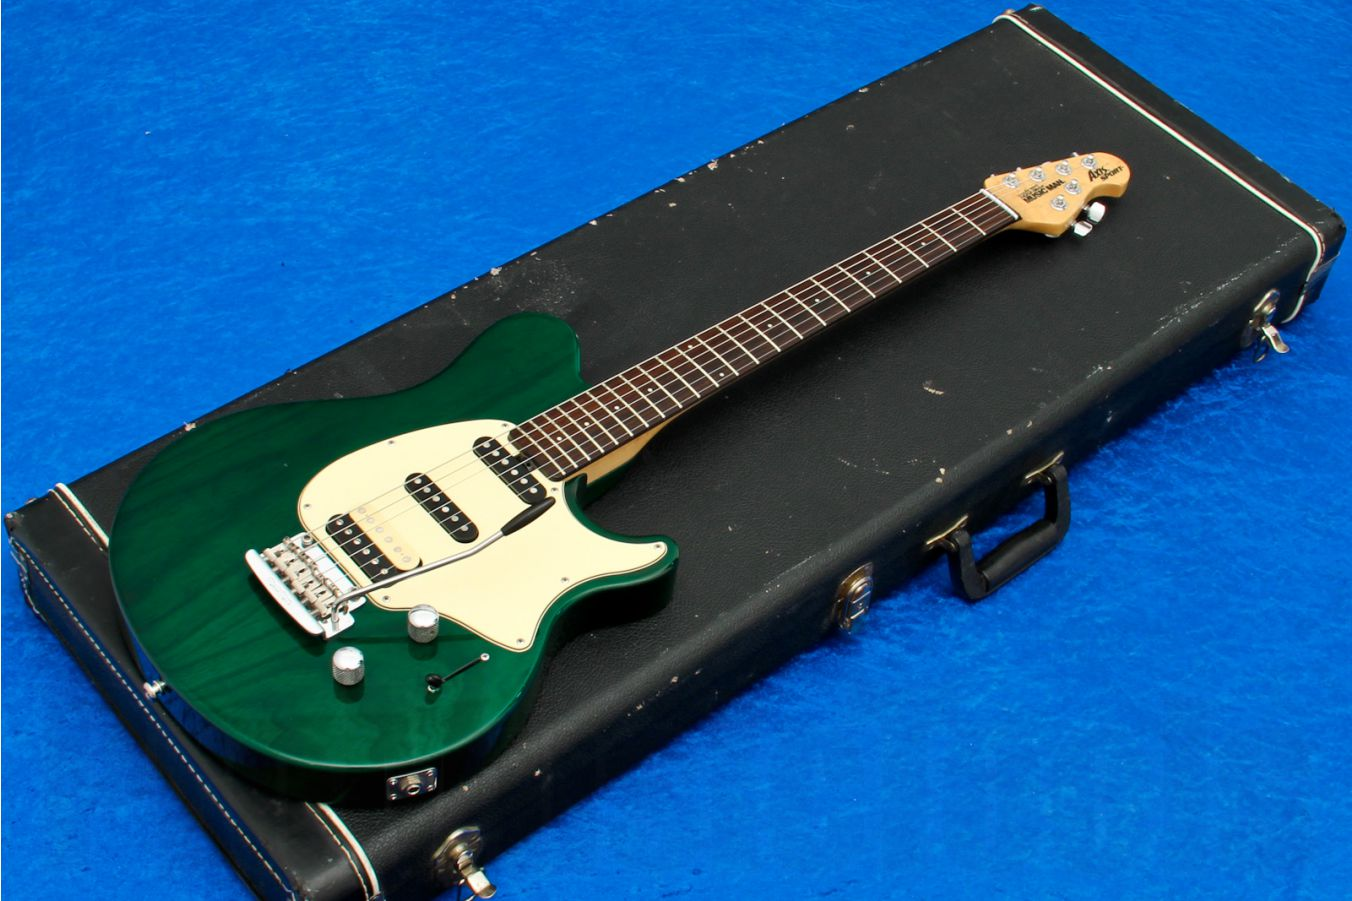 Music Man USA Axis Sport HSS Trem TGN - Translucent Green RW